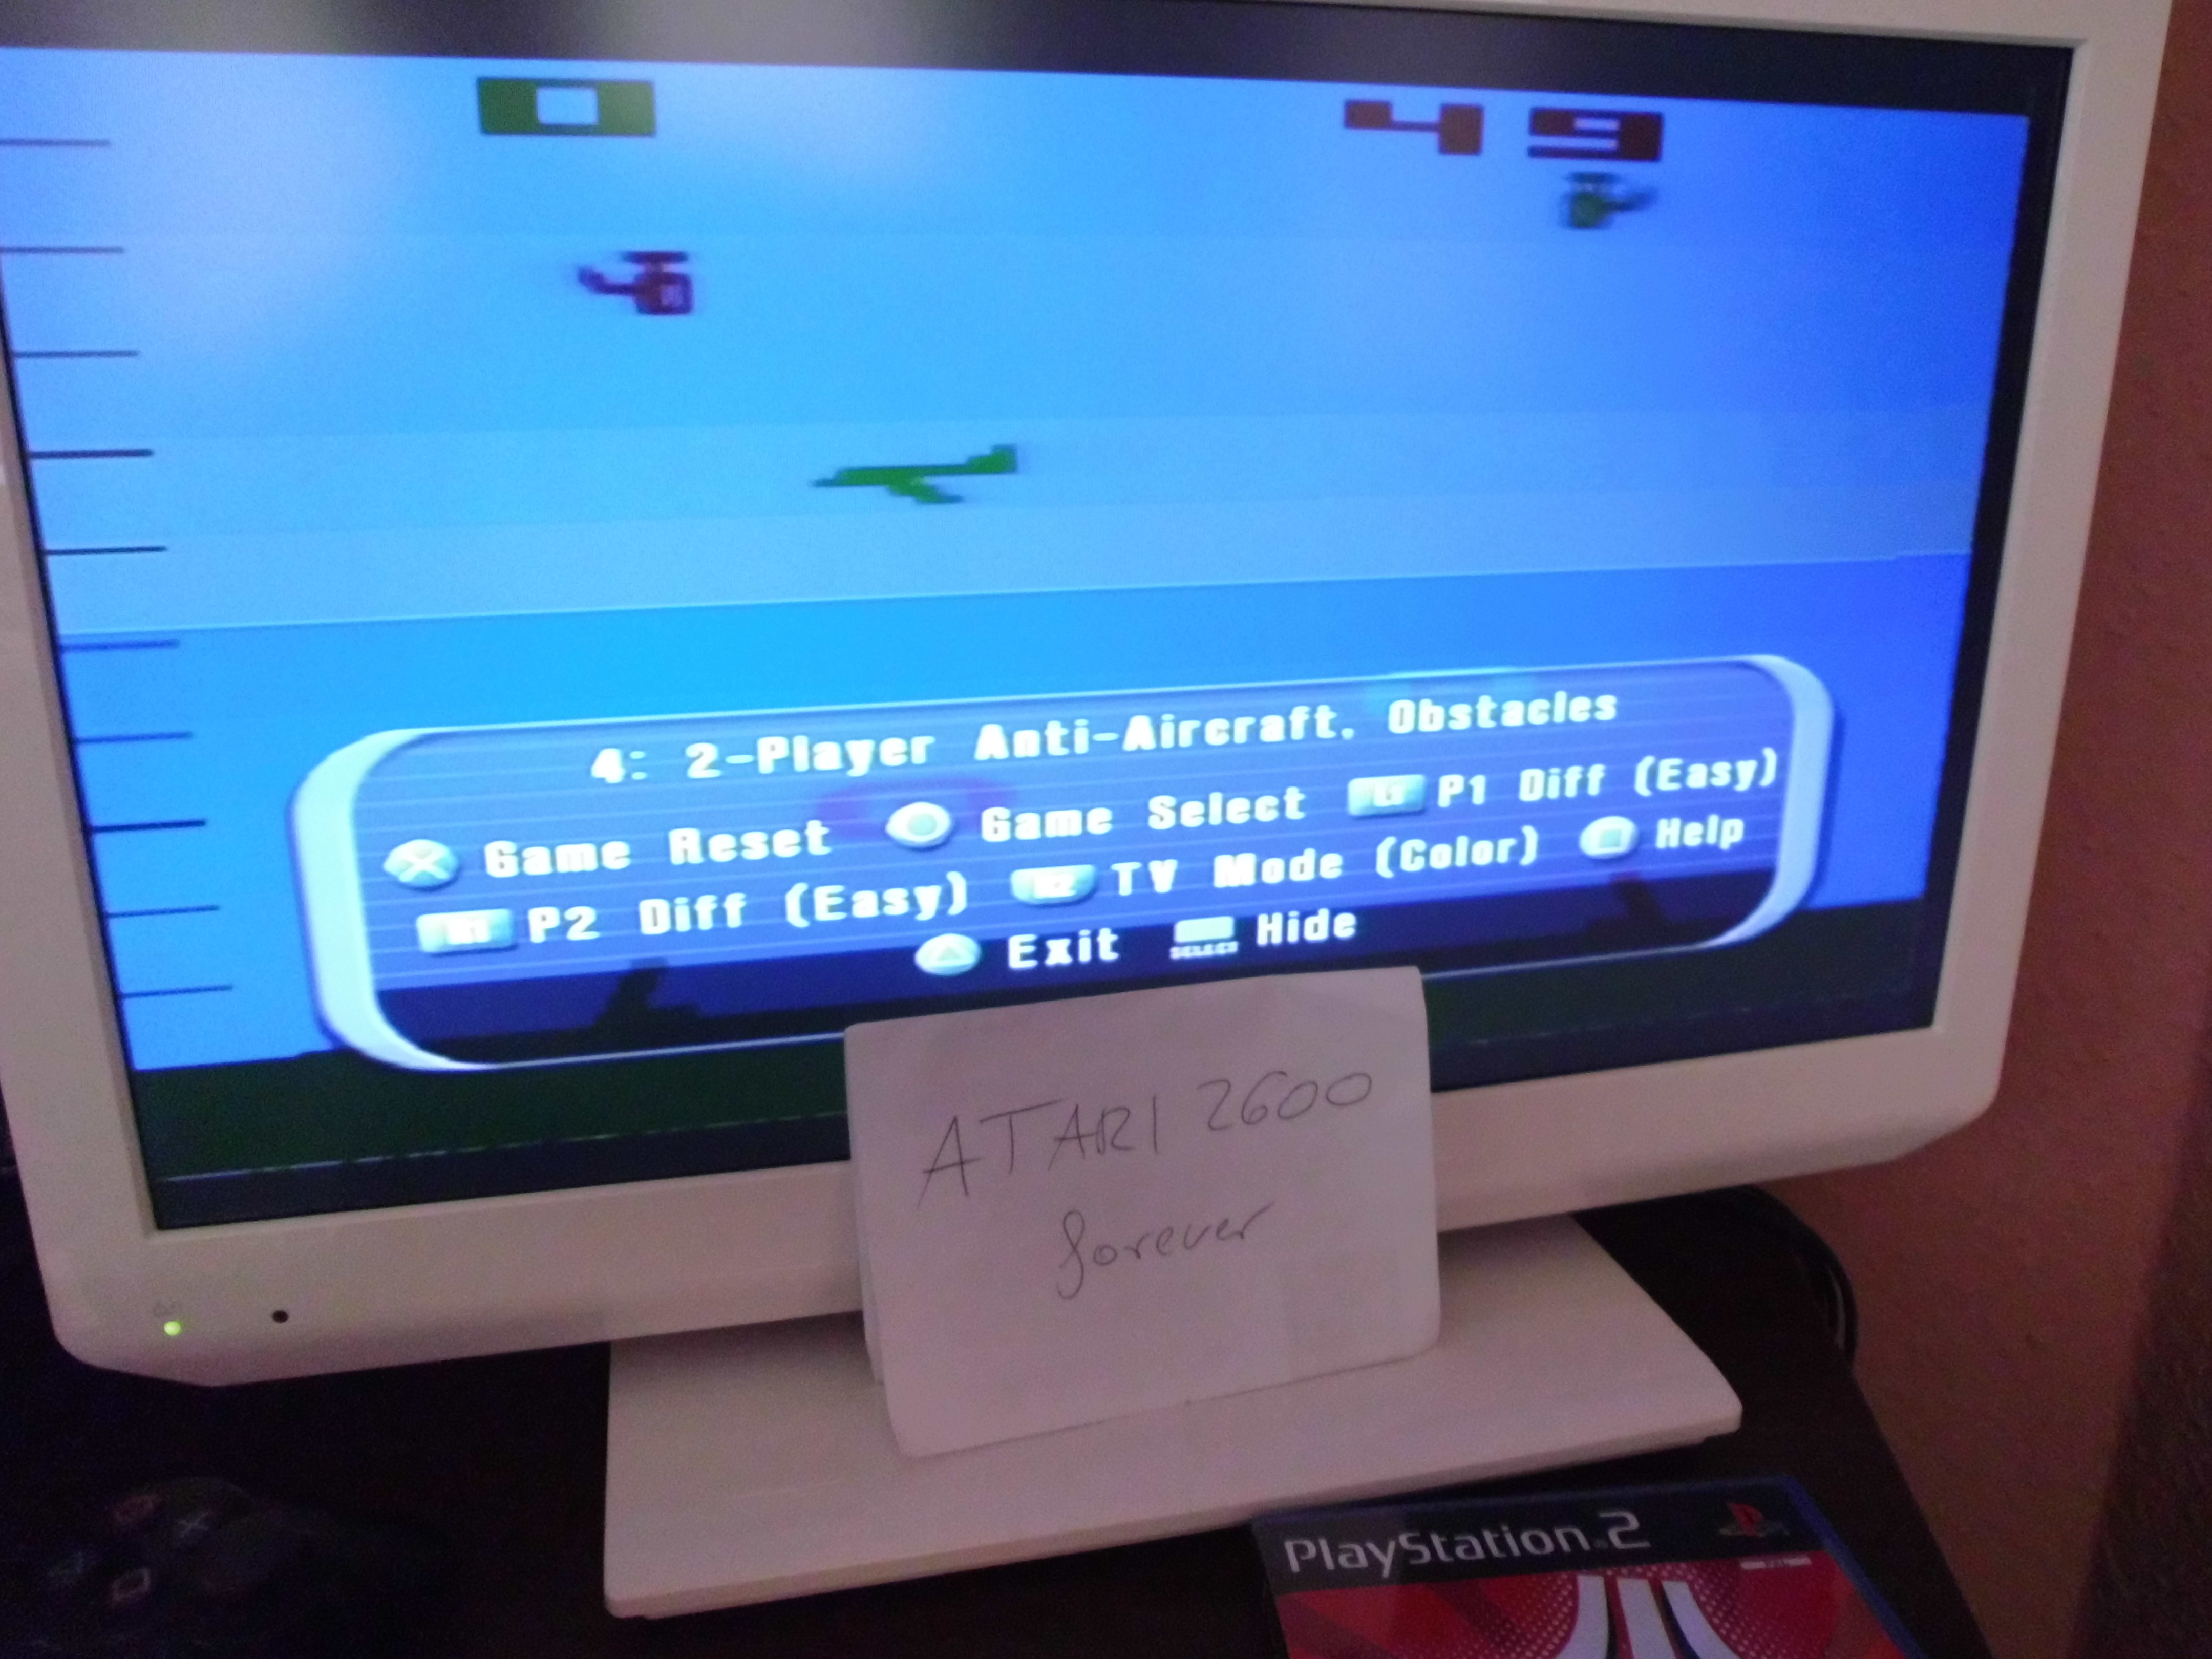 atari2600forever: Atari Anthology: Air-Sea Battle [Game 4B] (Playstation 2) 49 points on 2018-03-29 03:36:03